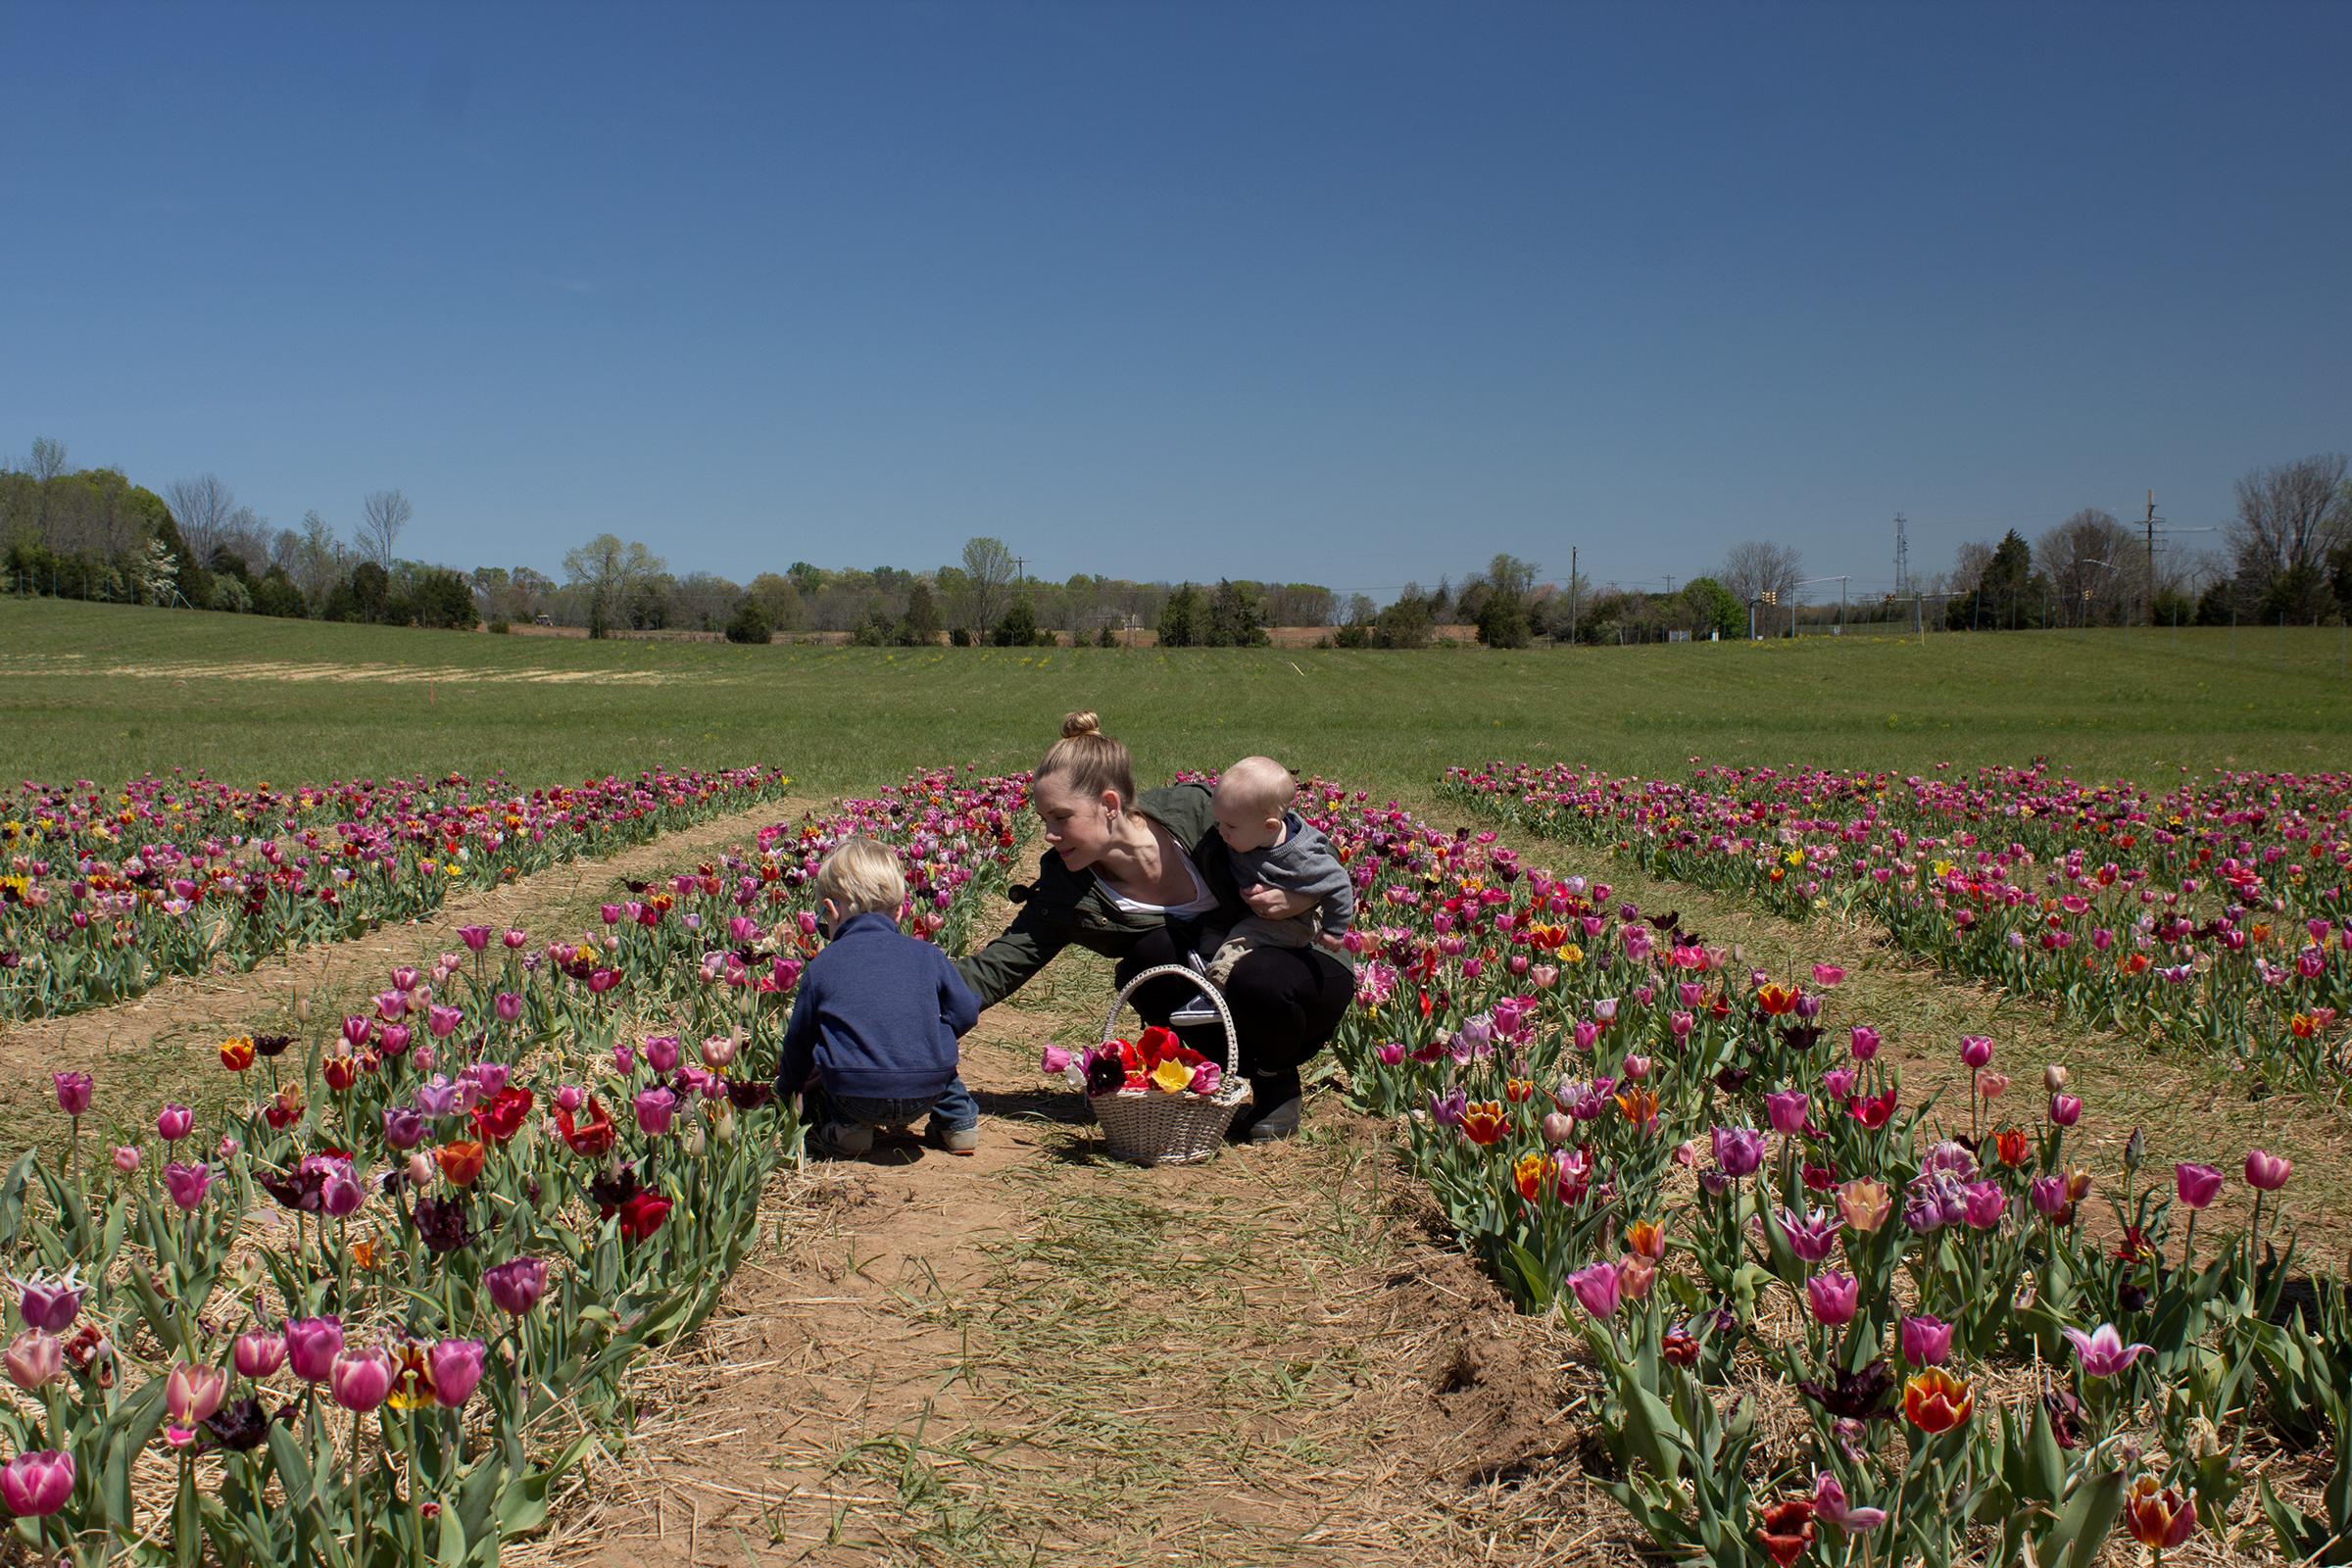 burnside-farms-tulips-nora-knox.png